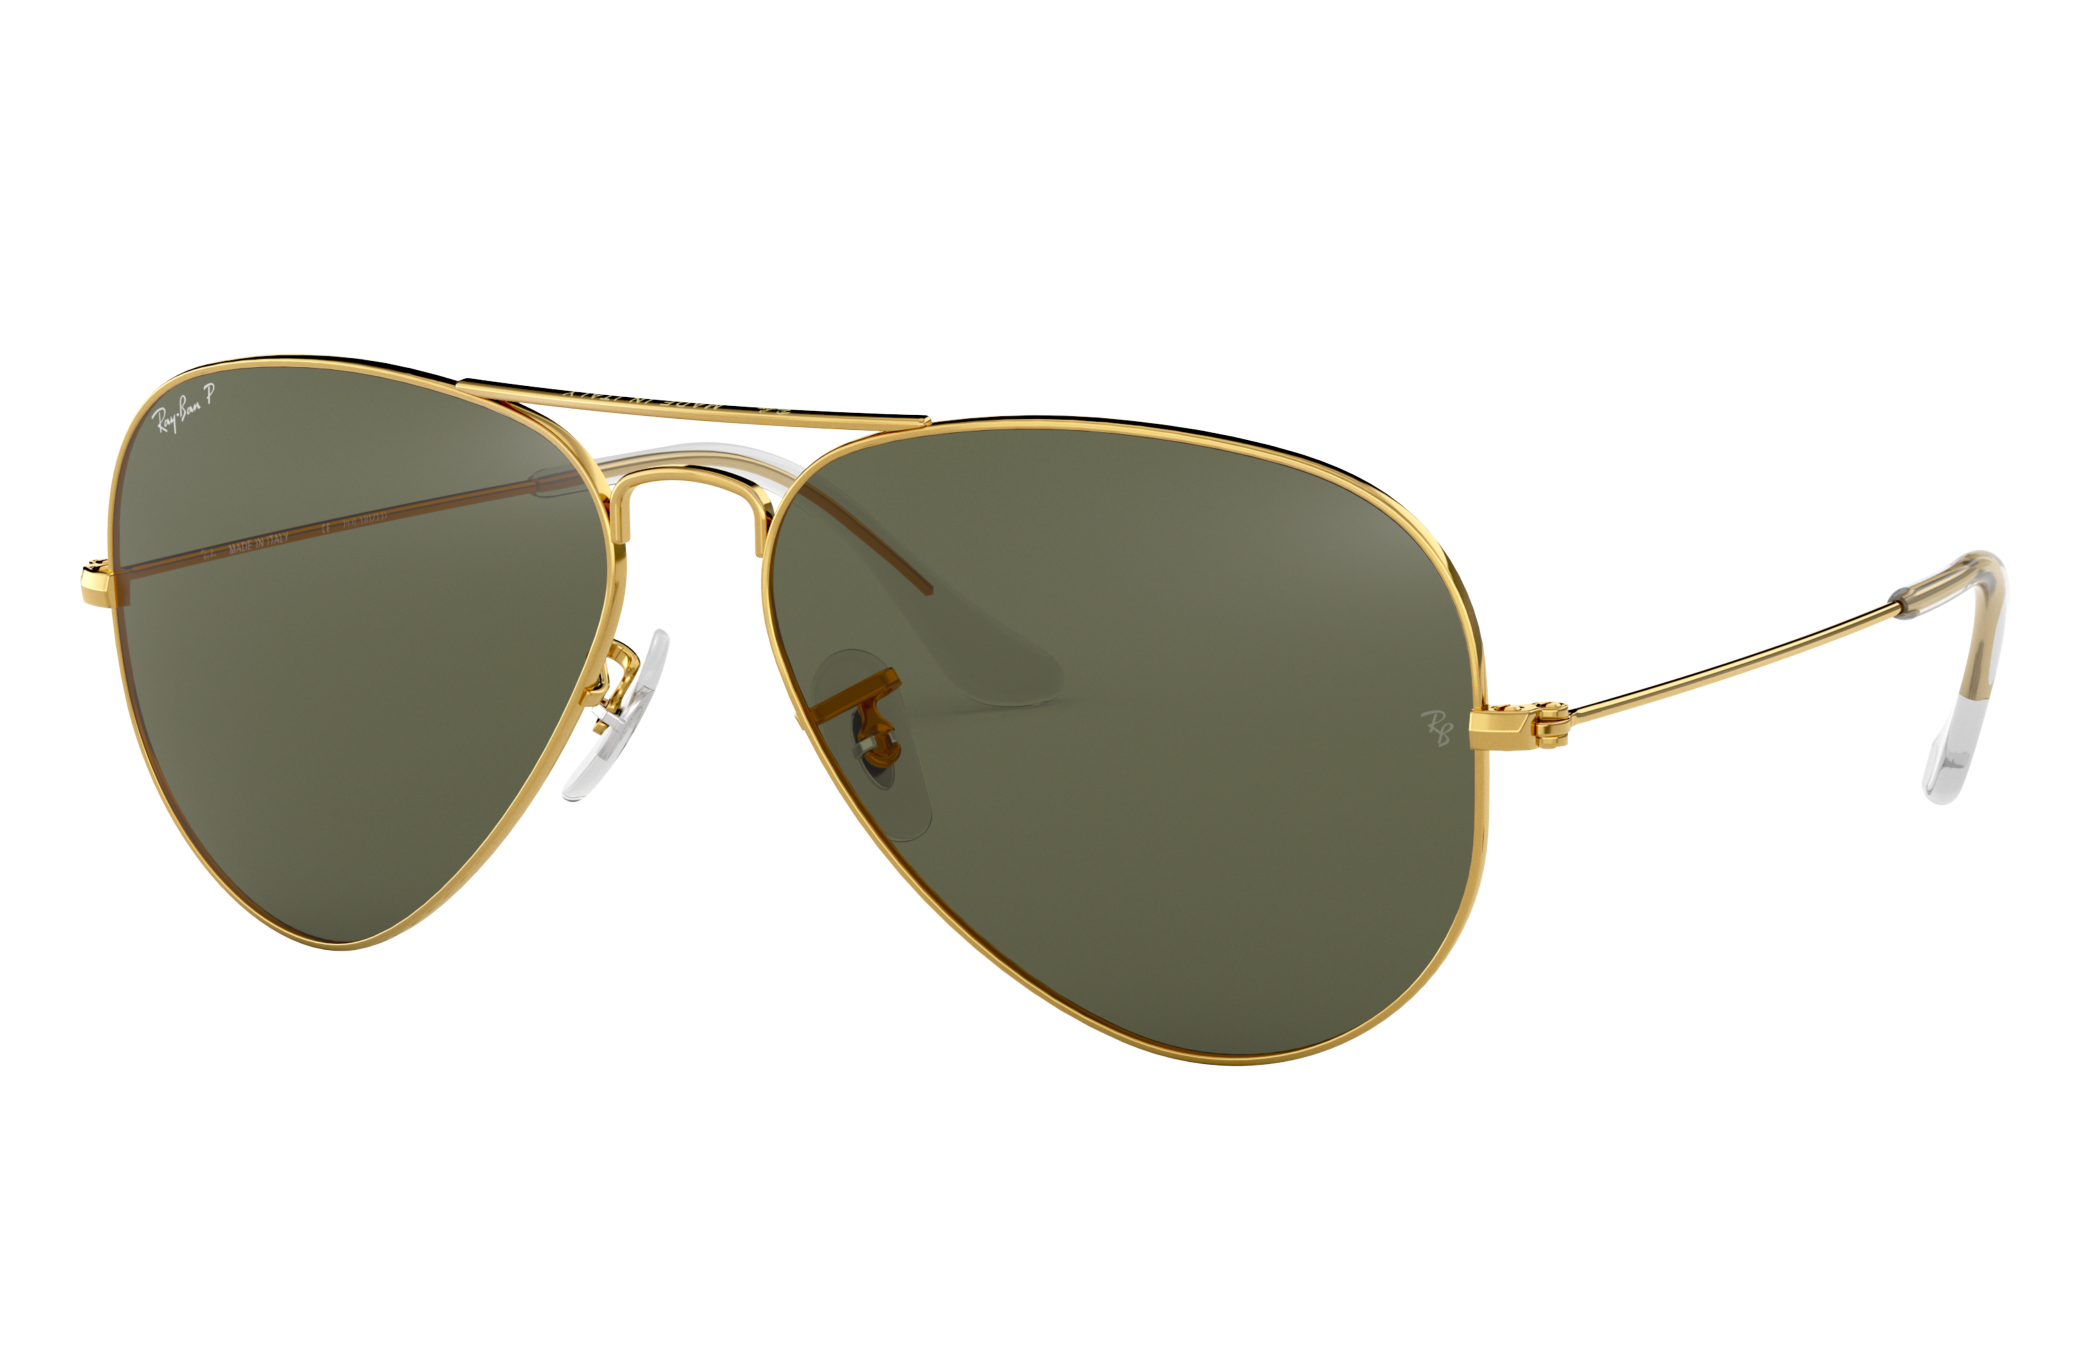 Ray-Ban Aviator Classic Gold, Polarized Green Lenses - RB3025